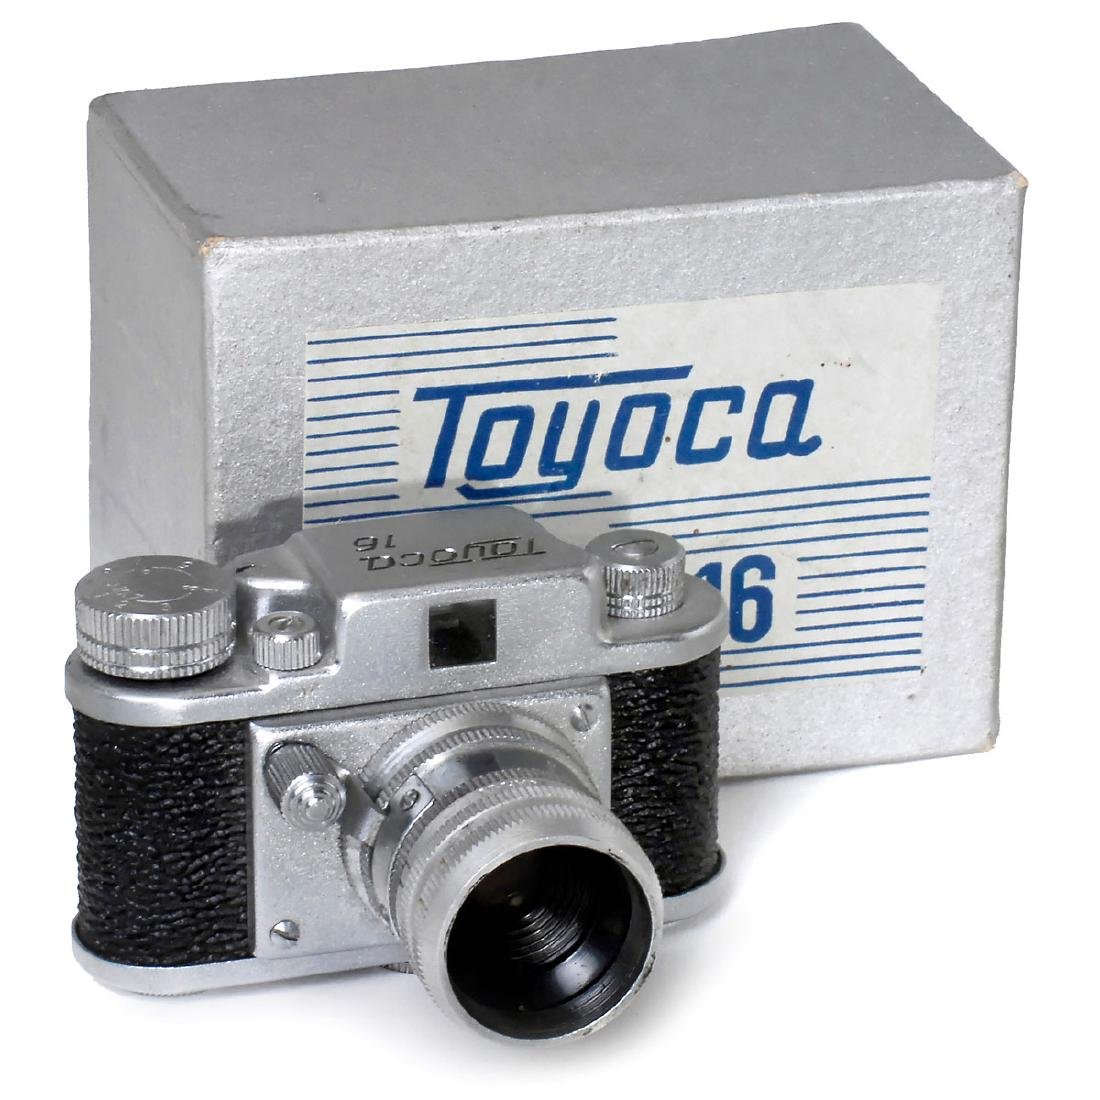 Toyoca 16 with Box, 1955